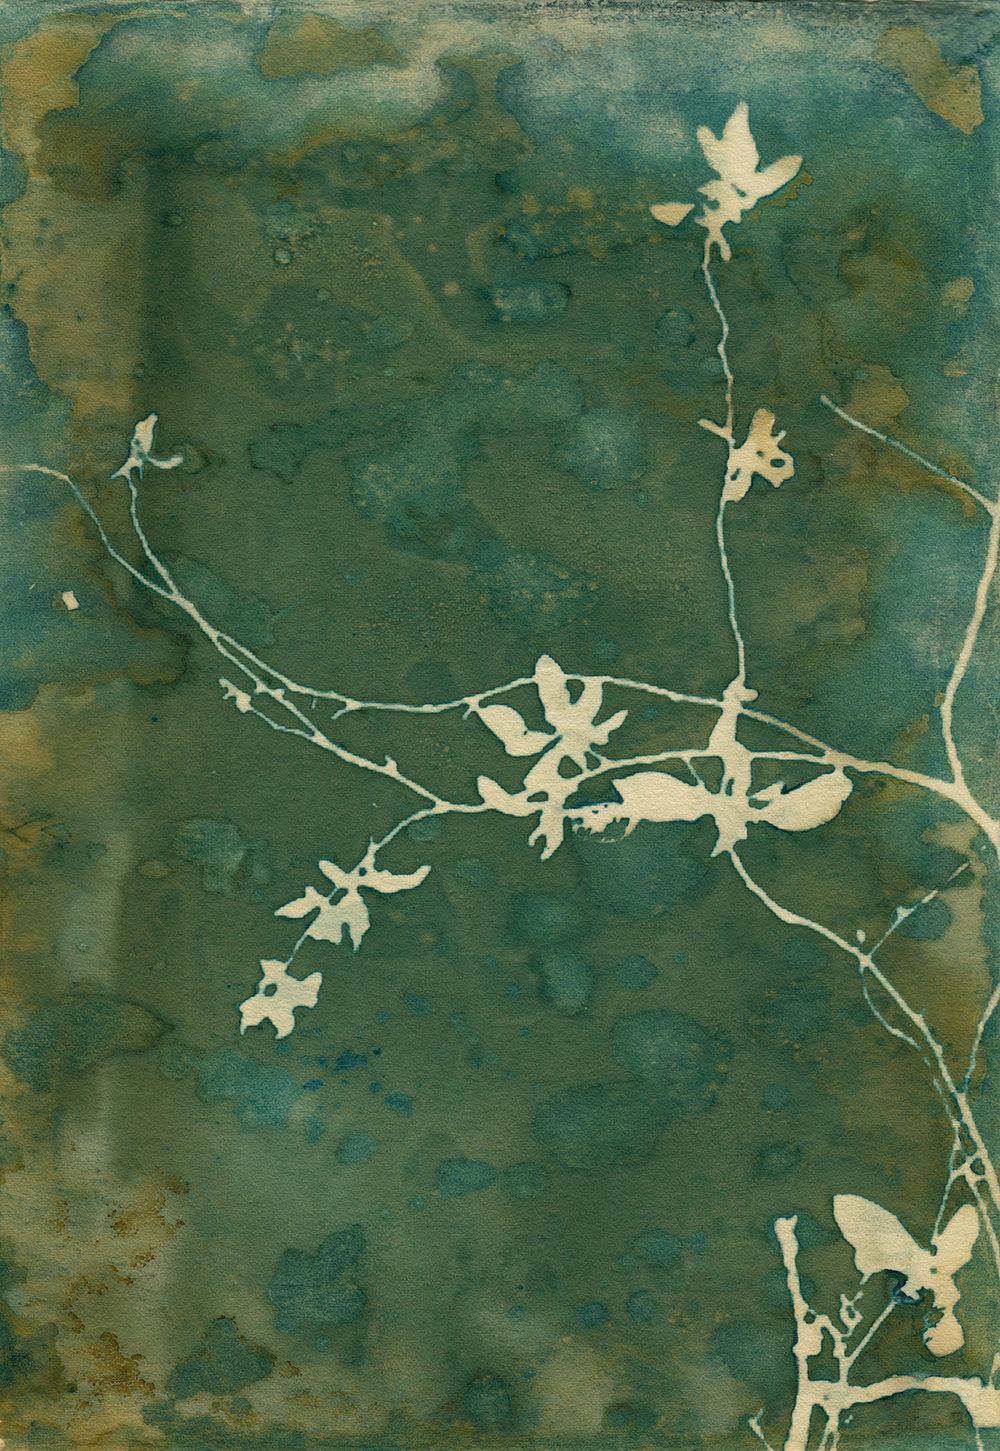 'Wandering Flowers' cyanotype print by Krista McCurdy